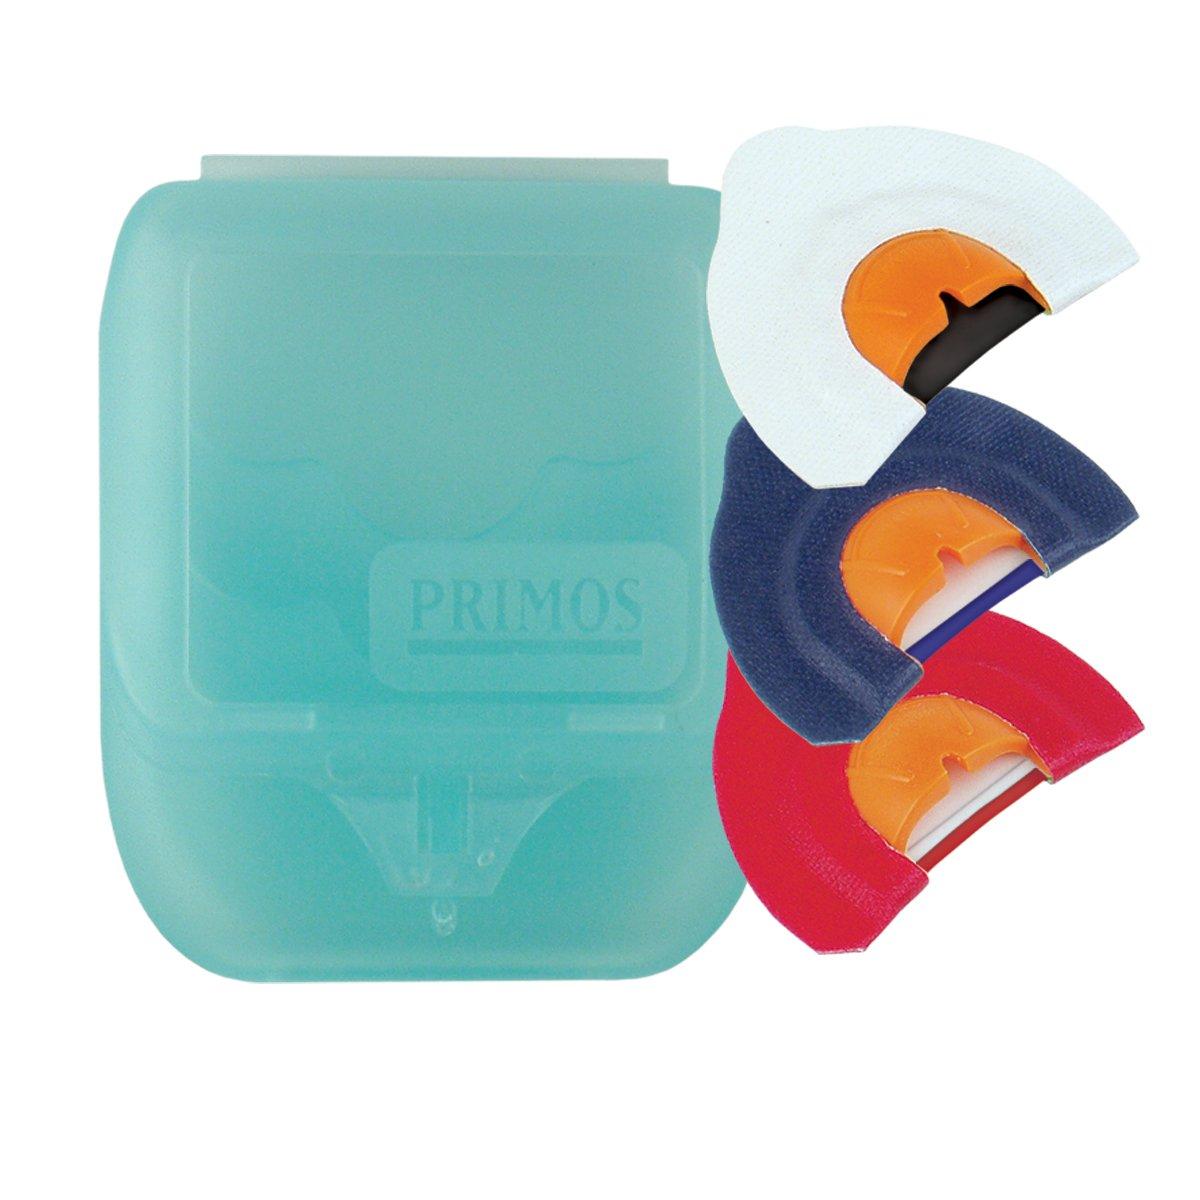 Primos Mini Sonic Dome Elk Call (3-Pack)